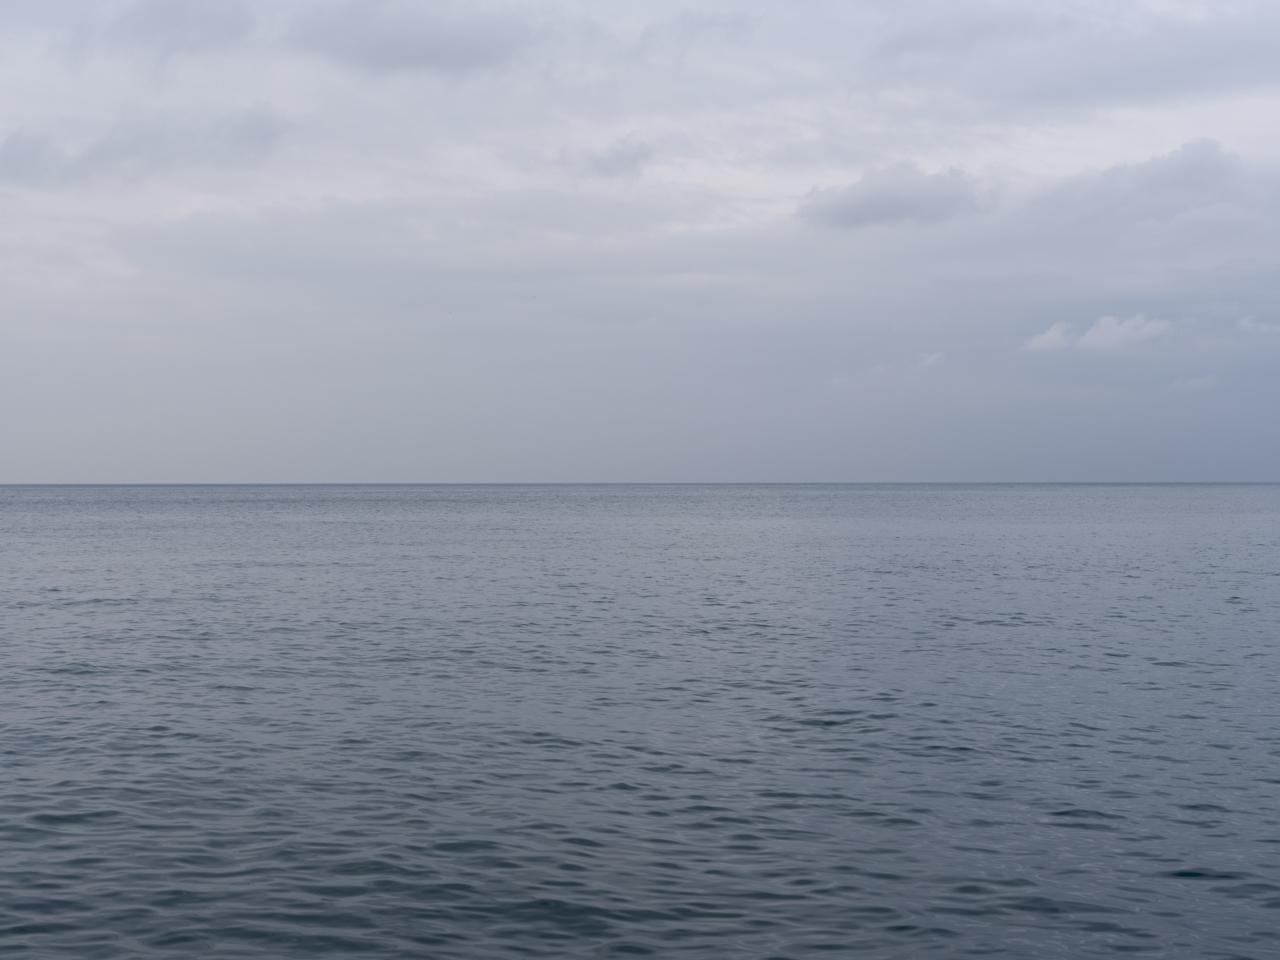 Lake Michigan on a gray and still day